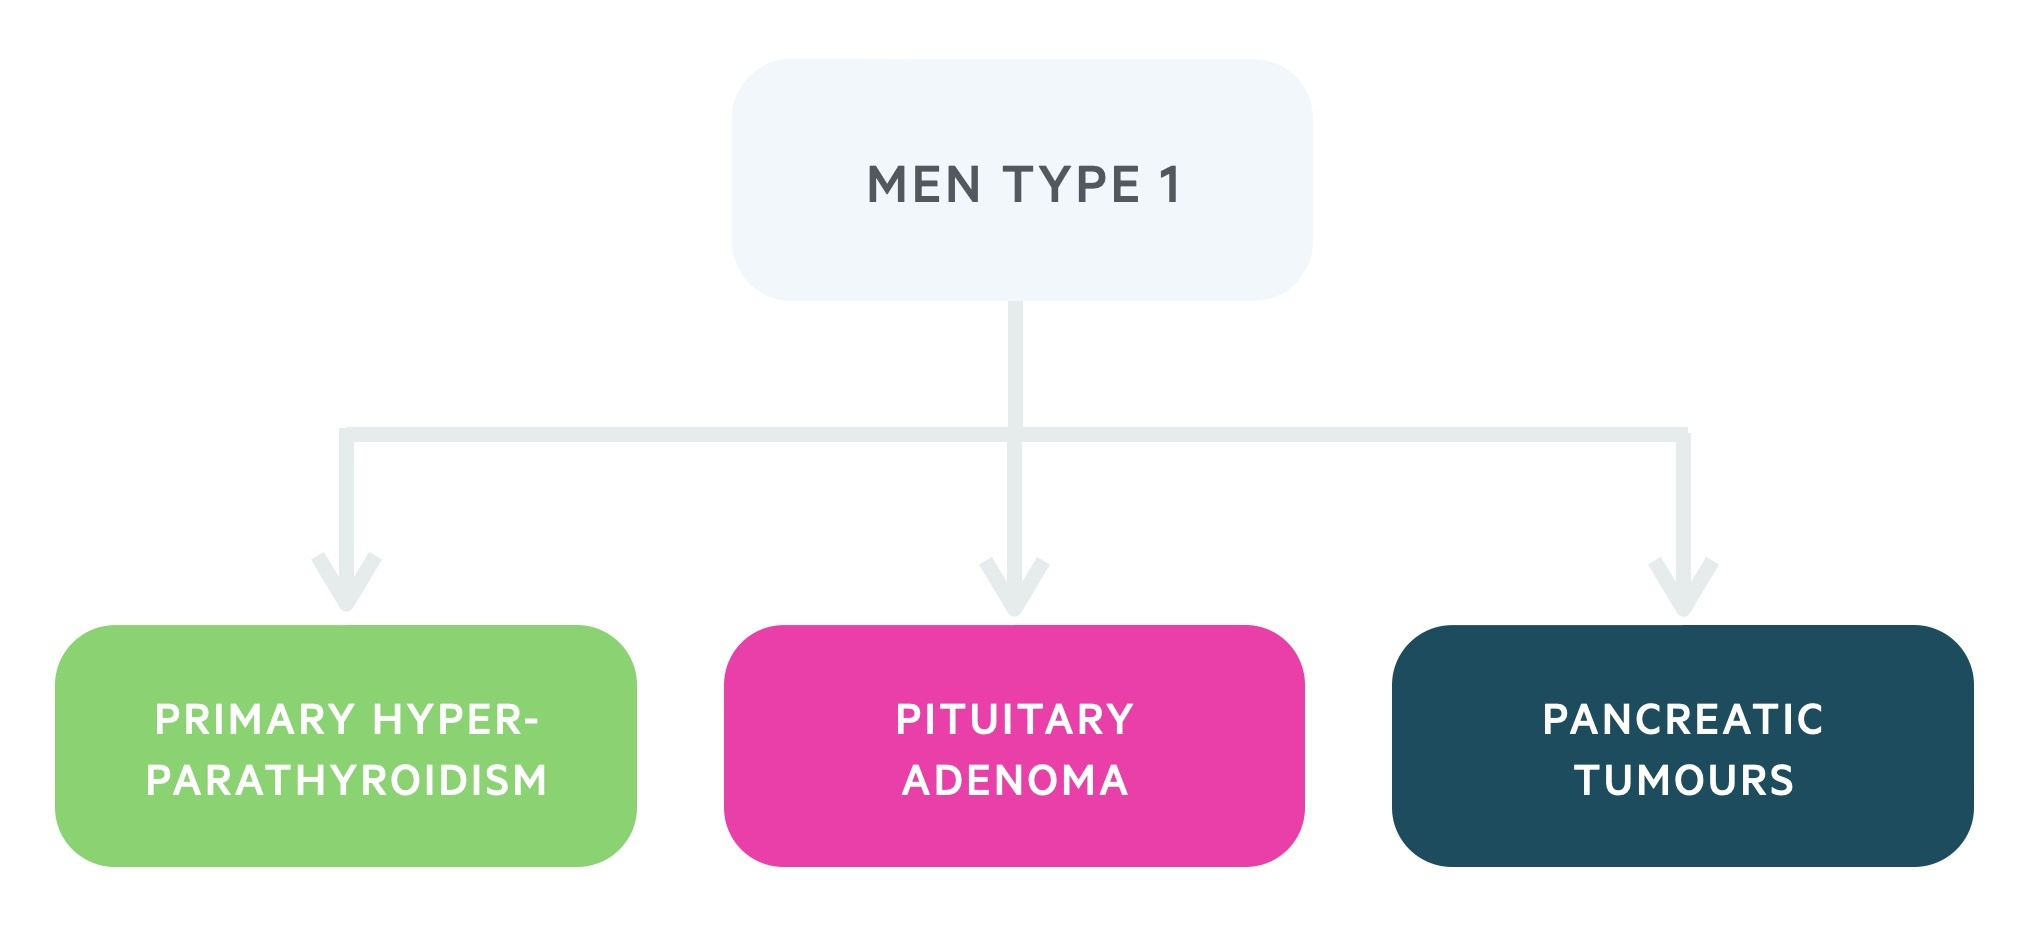 Manifestations of MEN type 1